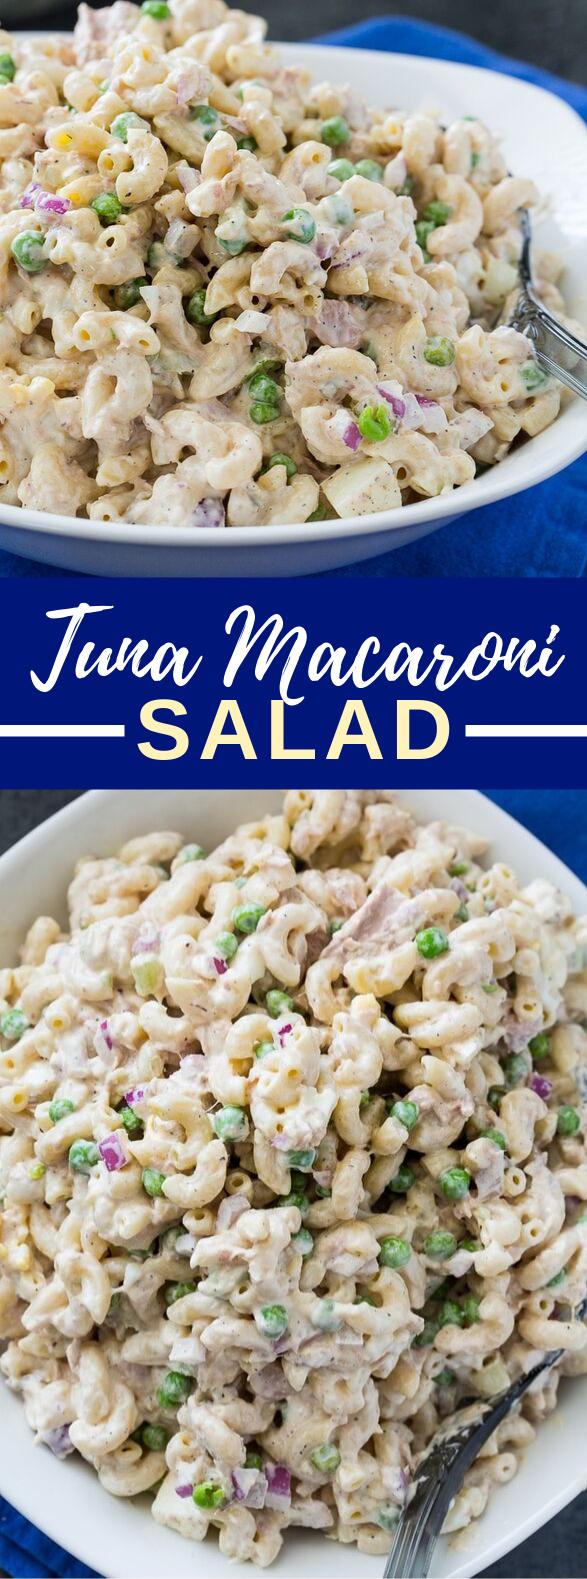 Tuna Macaroni Salad #lunch #holidaypicnic